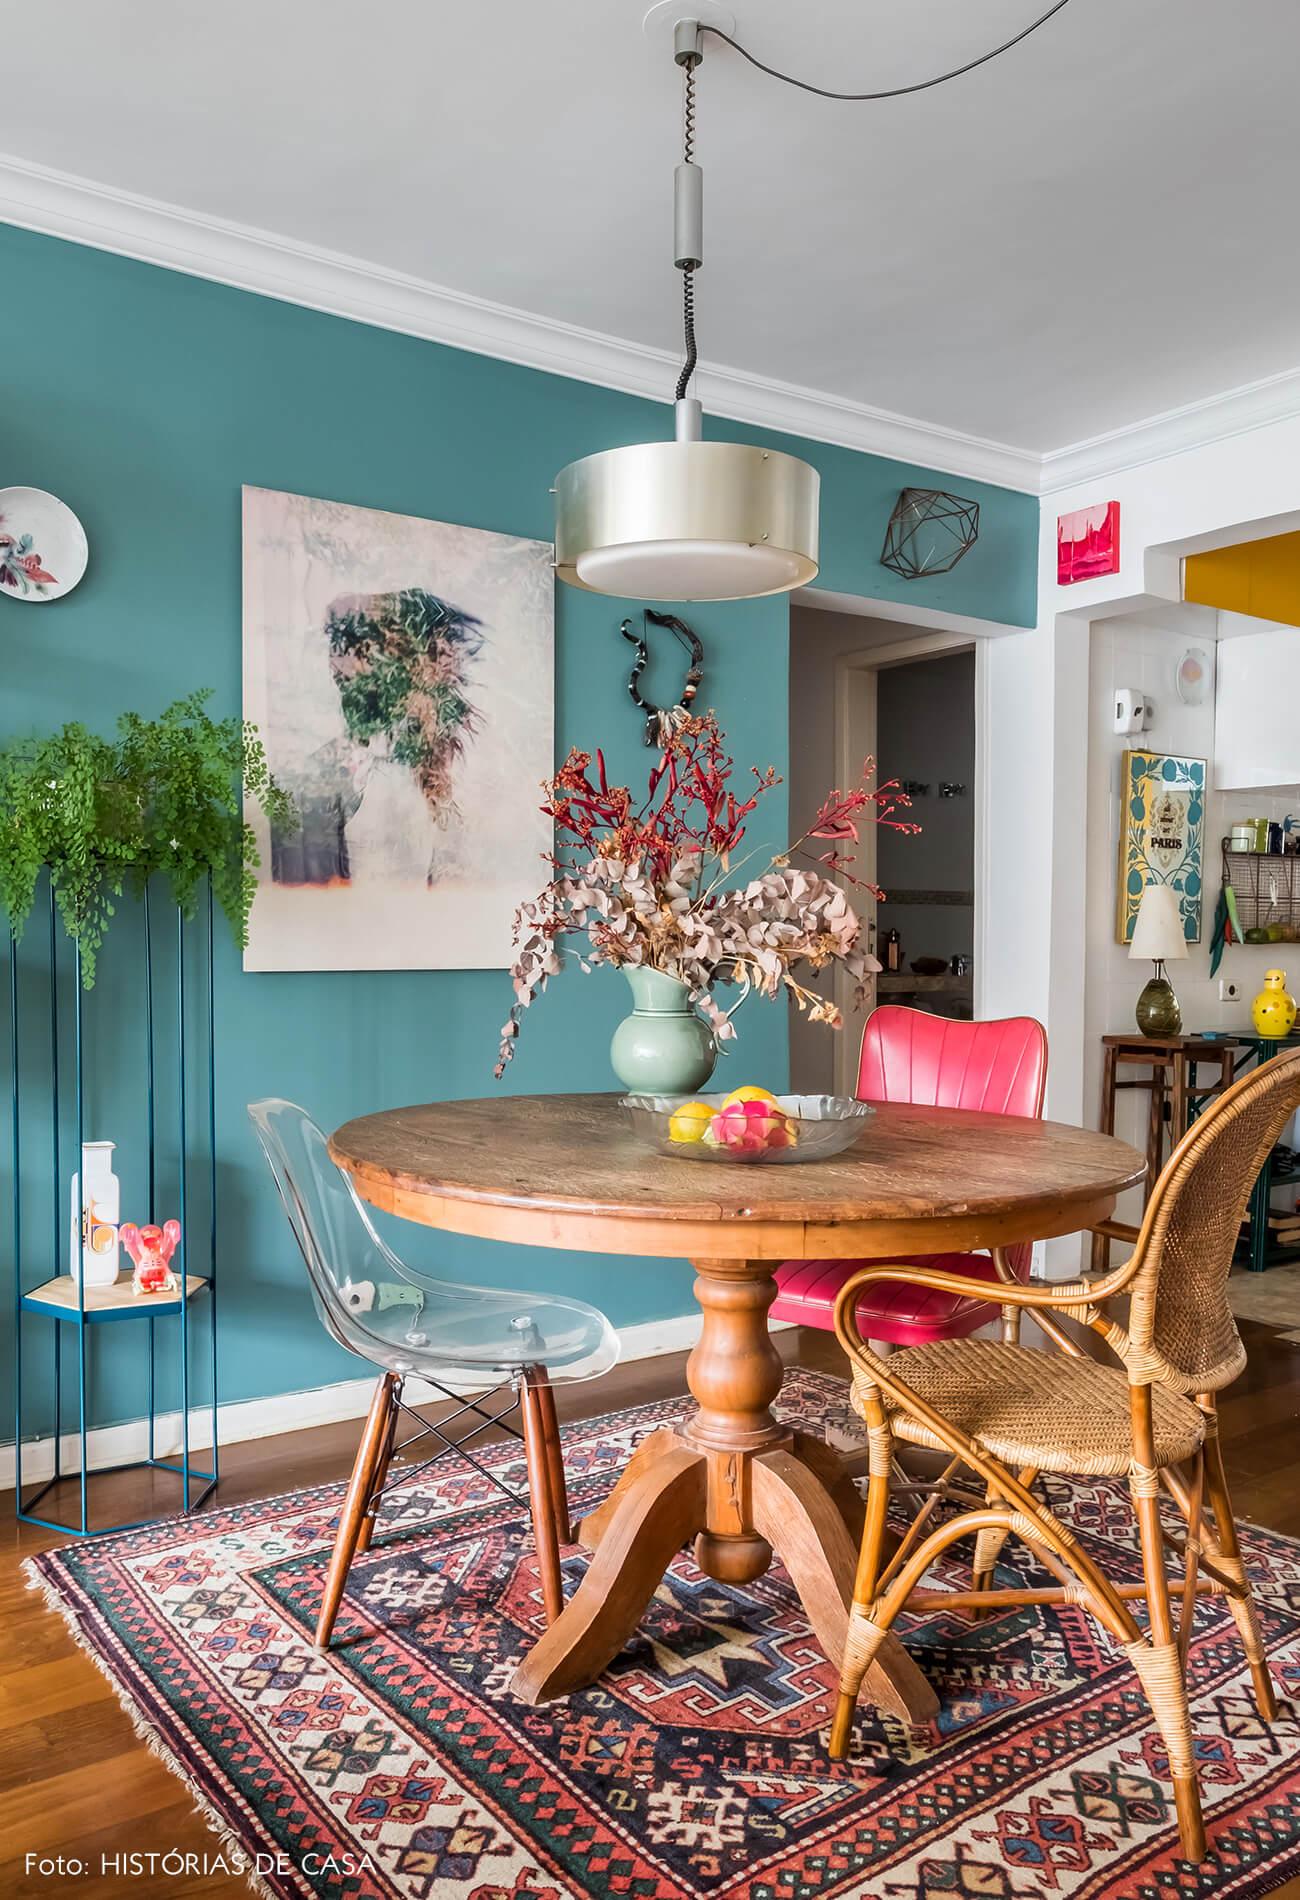 Sala de jantar com mesa redonda e parede pintada de azul